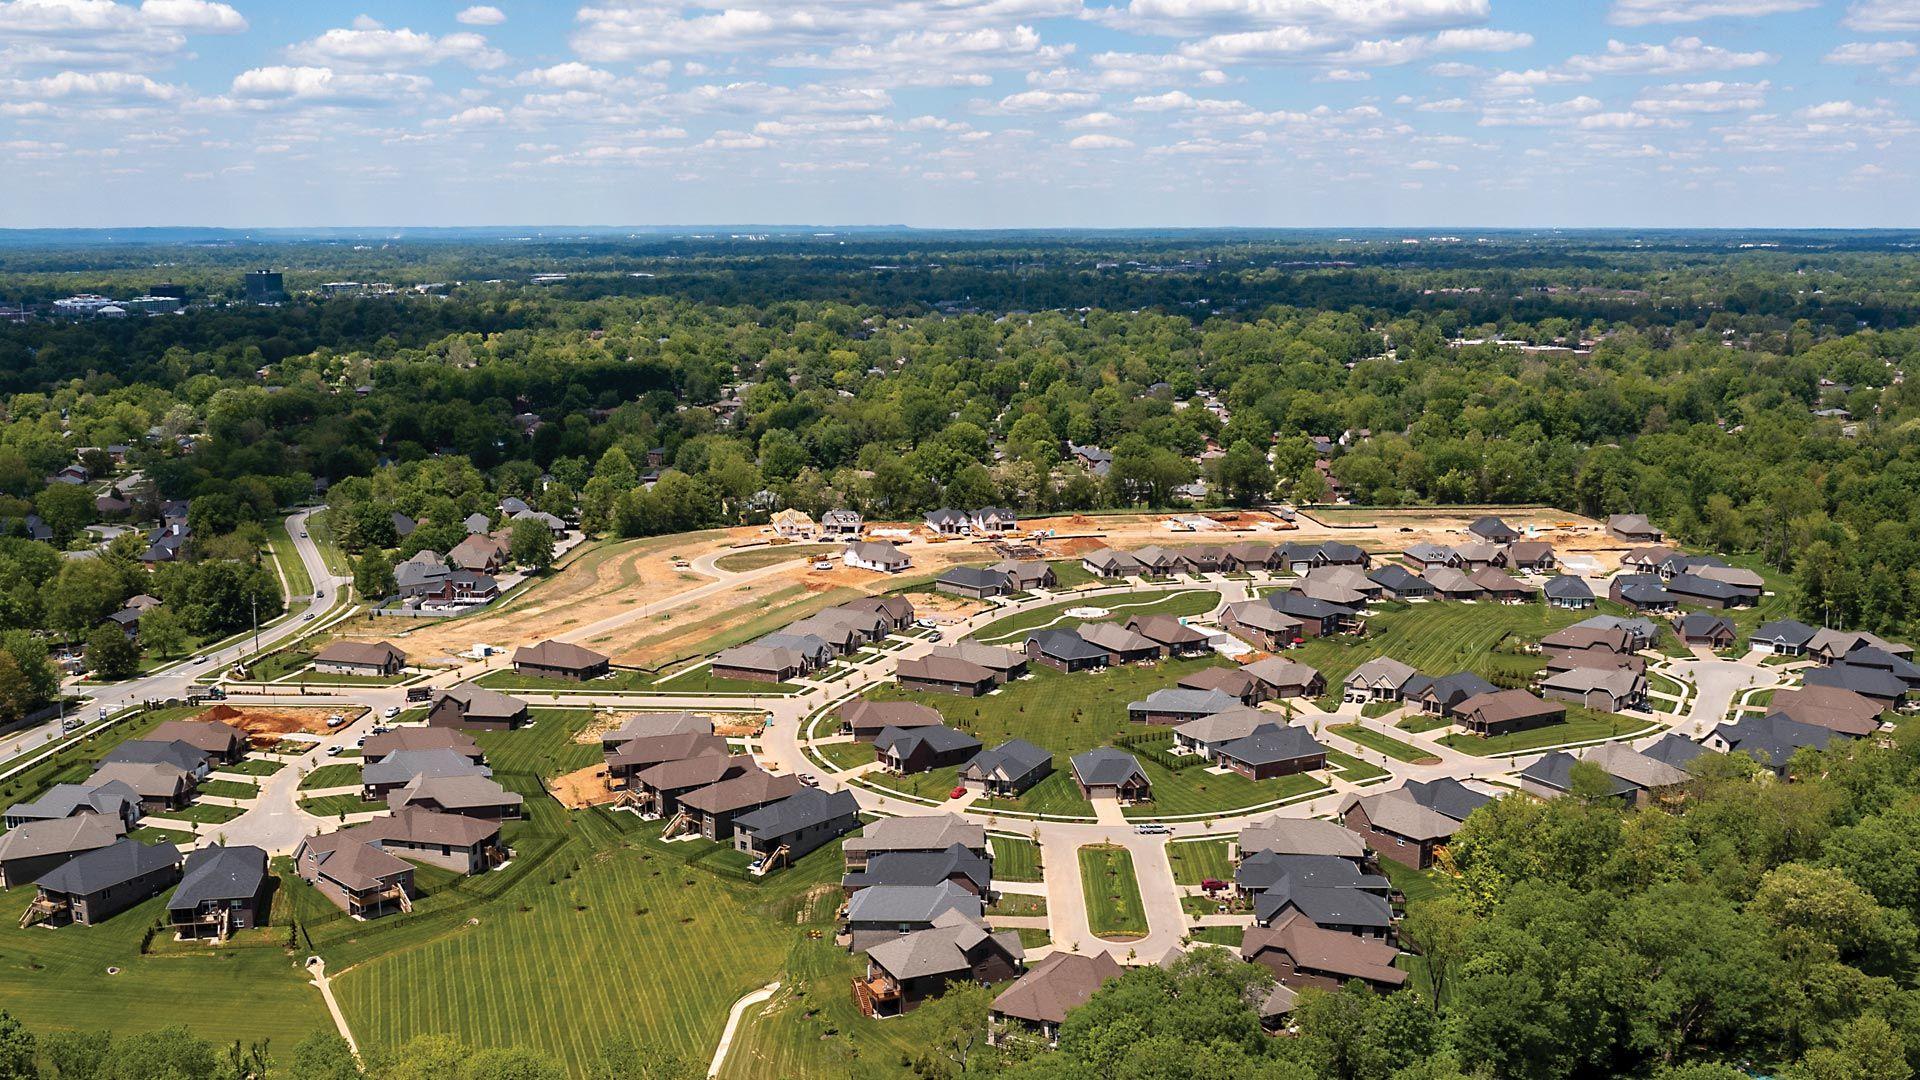 Enclave at Douglass Hills Aerial:Enclave at Douglass Hills